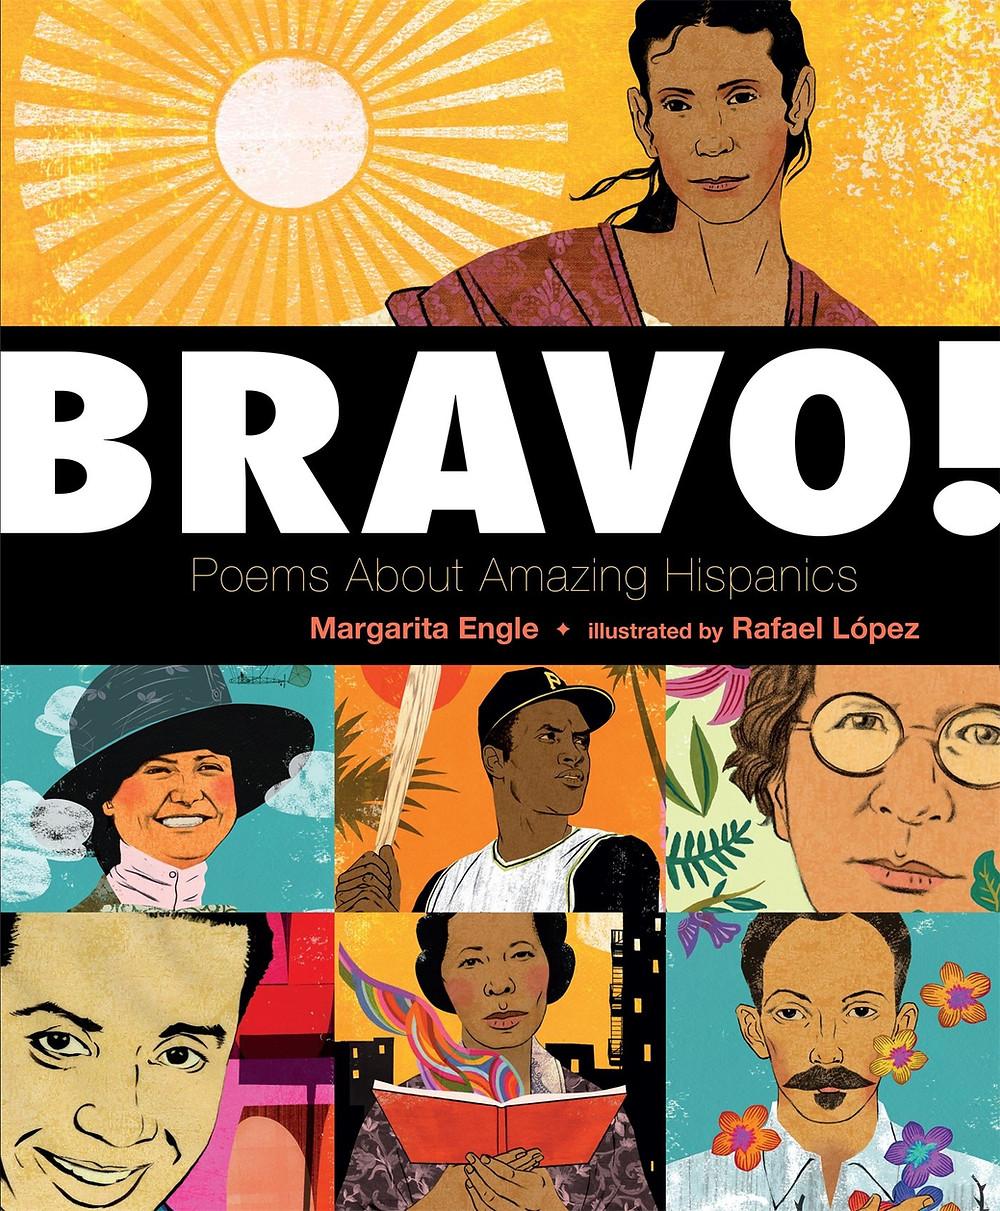 #poetrybooksforkids #poemsabouthispanics #bravo!